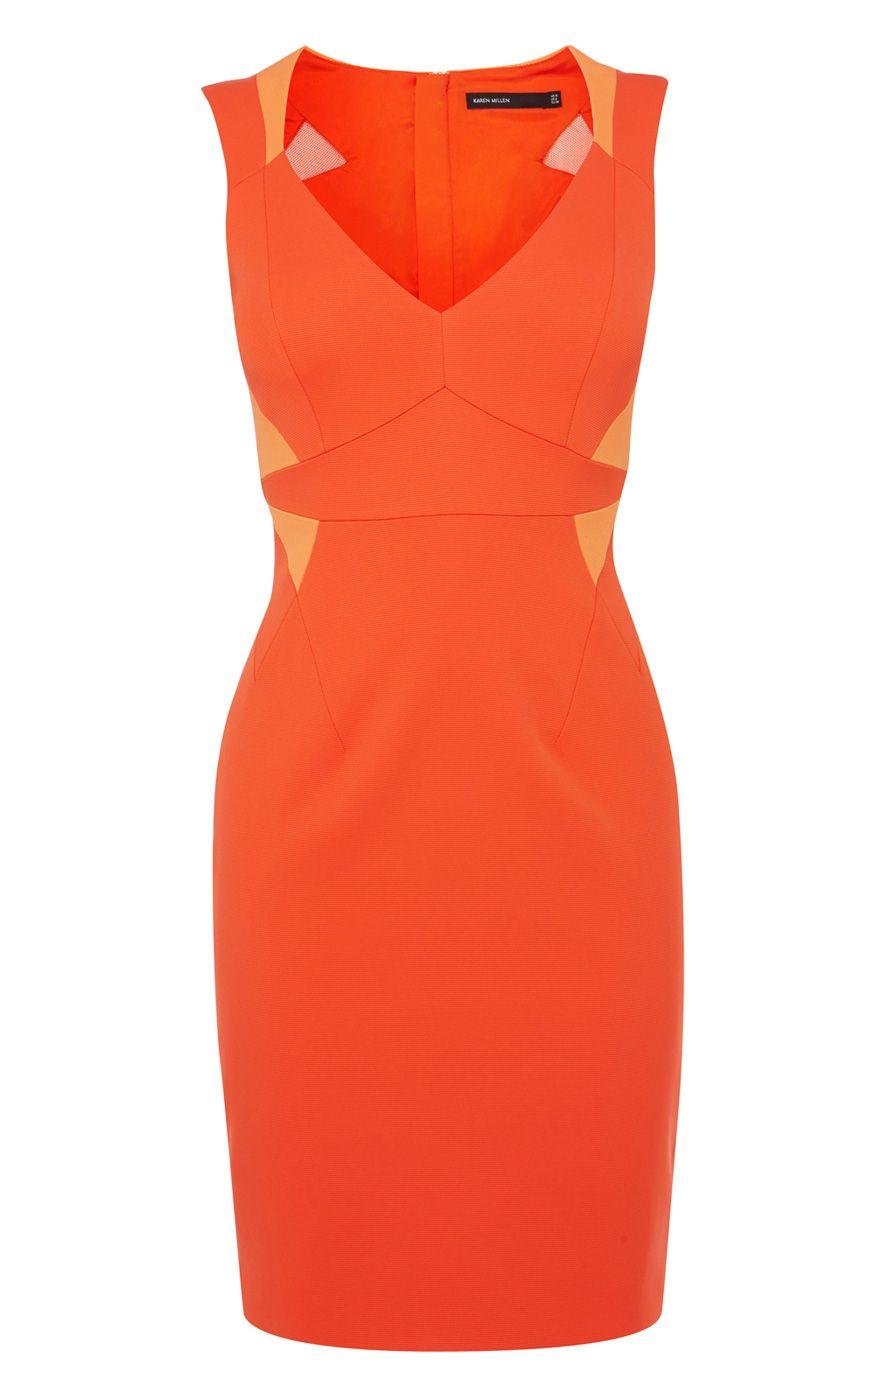 Vêtements | Orange Robe fourreau orange stretch style ottoman | Karen Millen